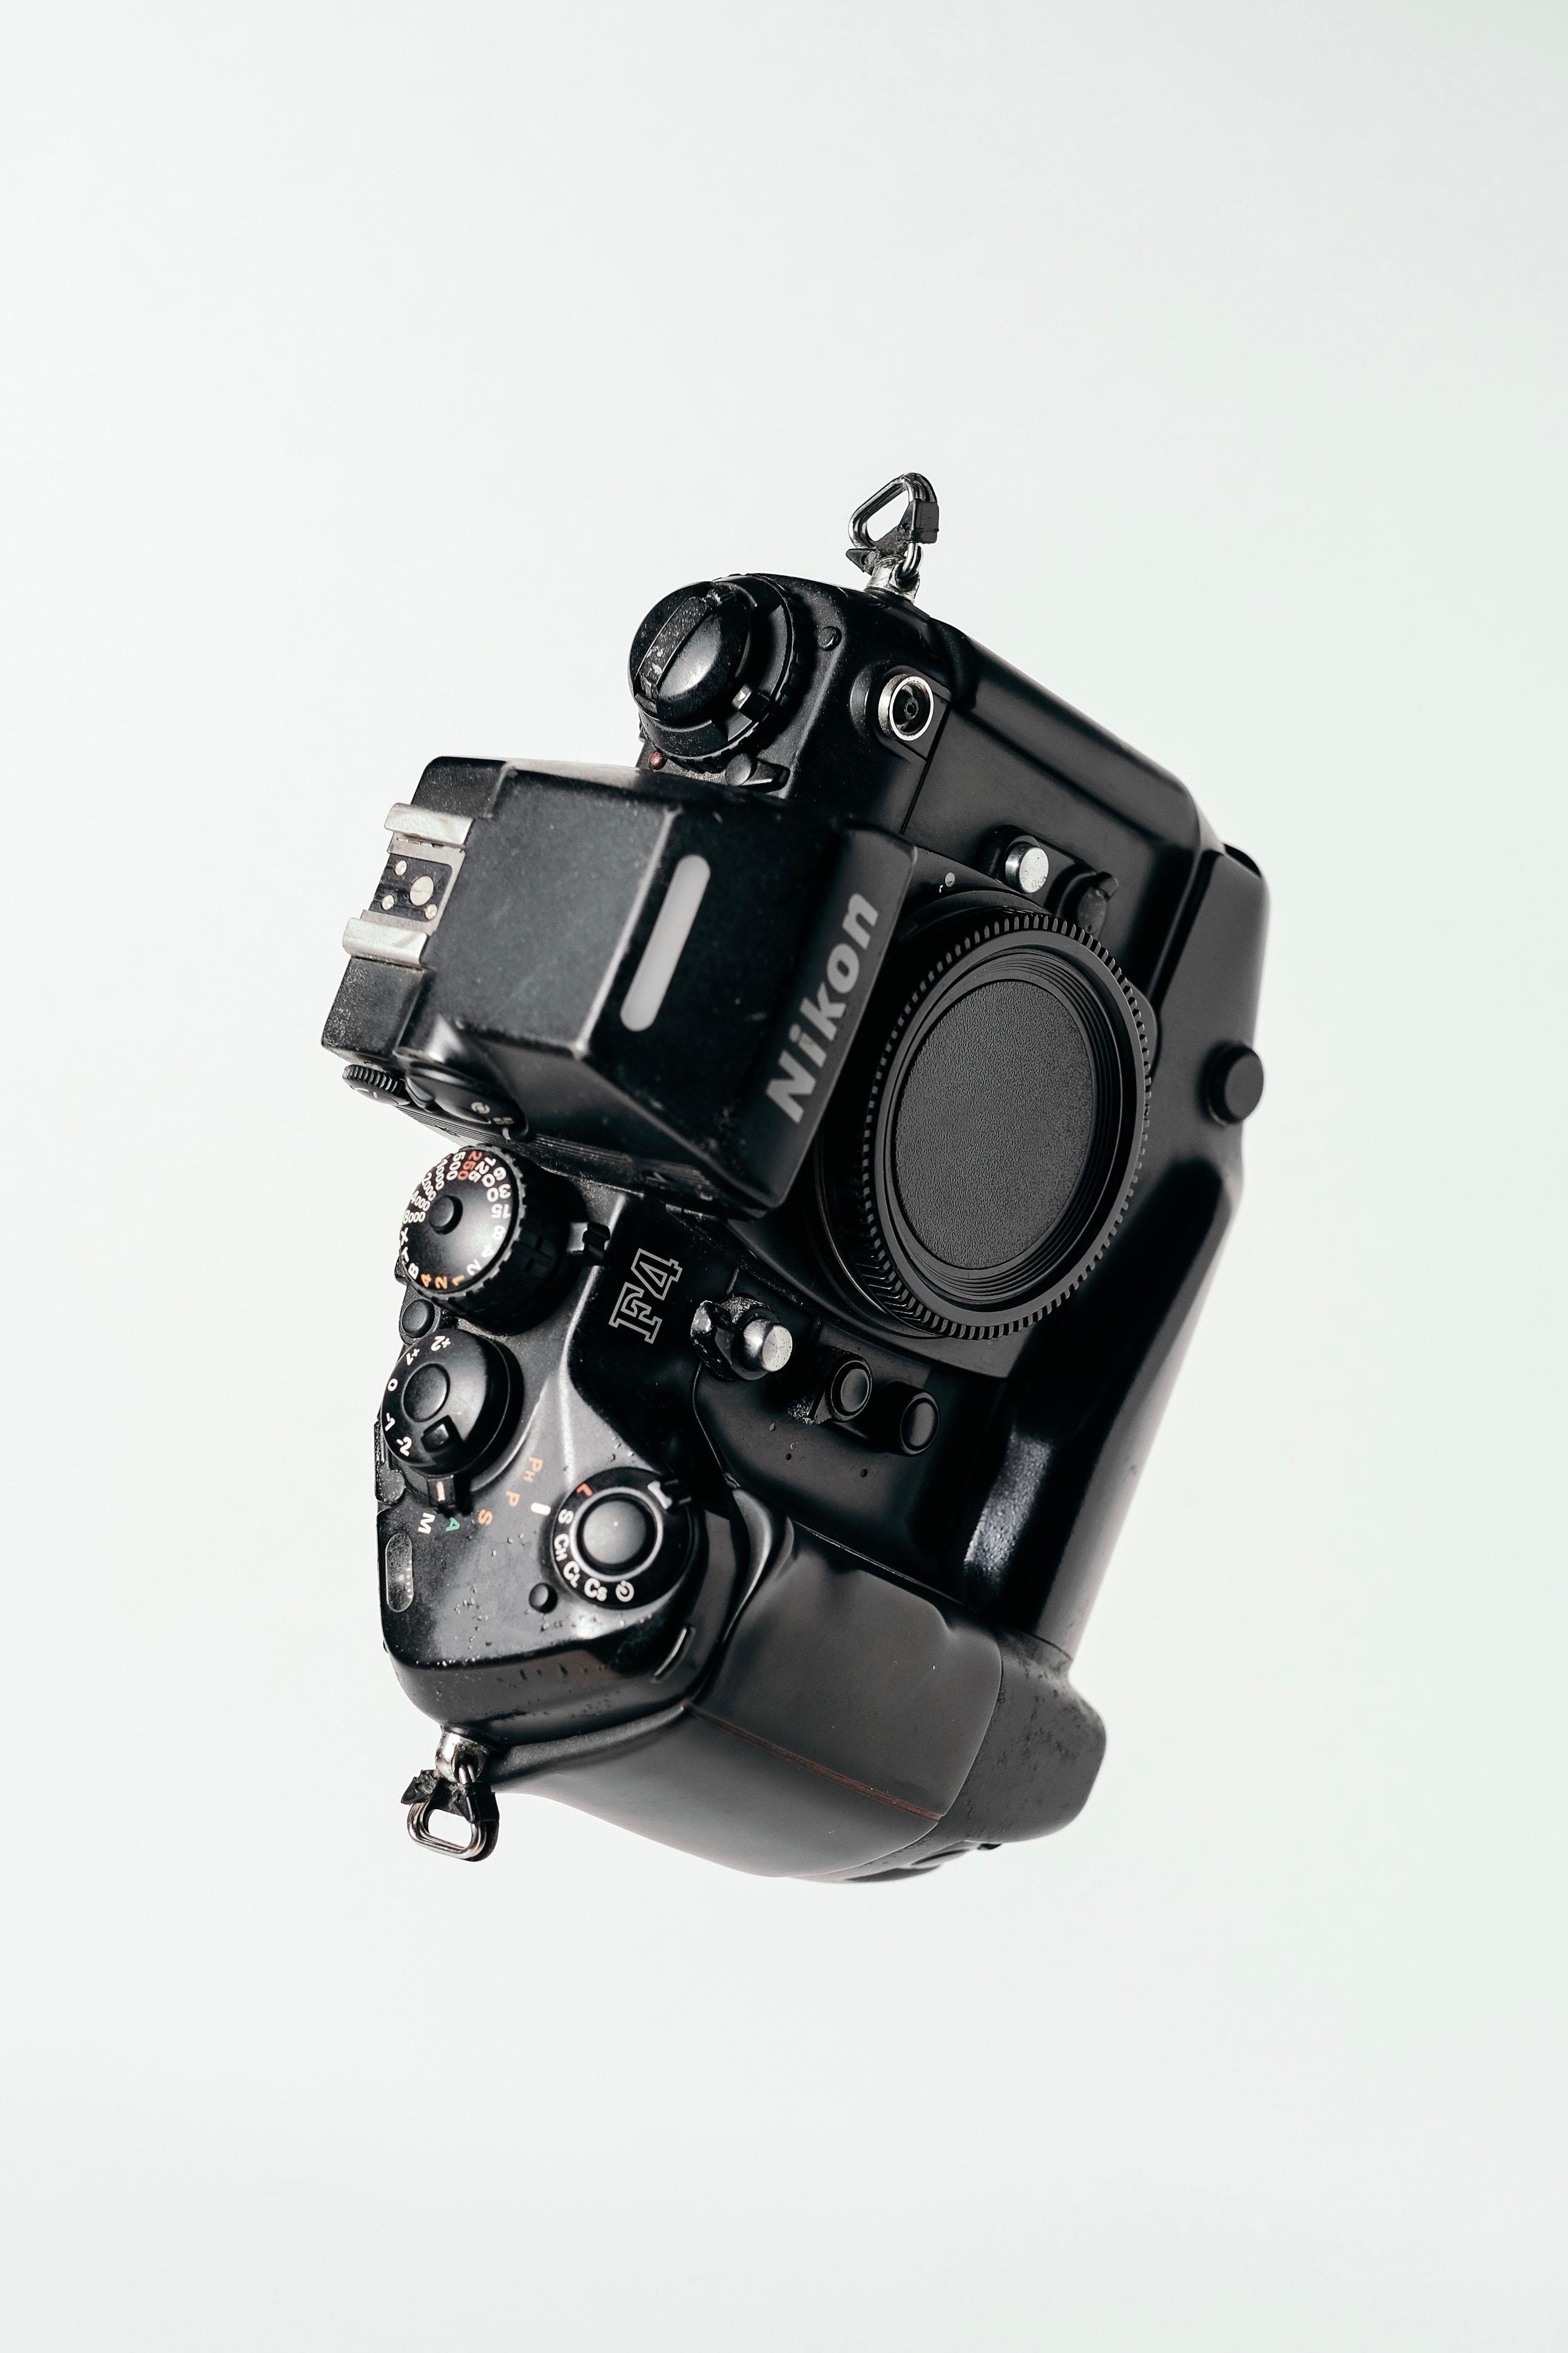 Digital Photography Group